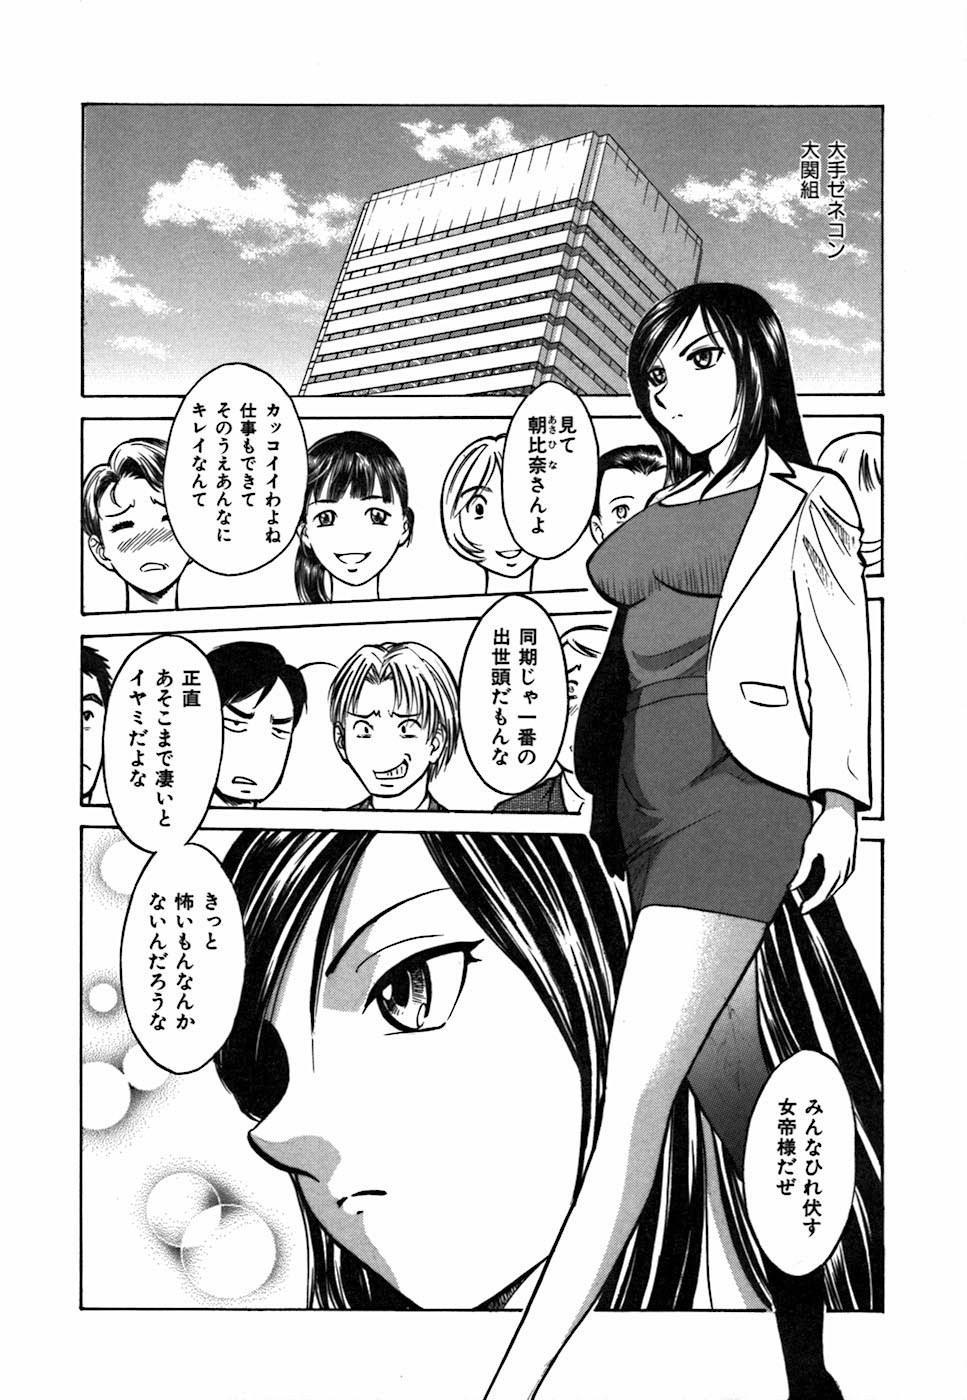 Kimi ga Nozomu Katachi | Appearance for which you hope 43